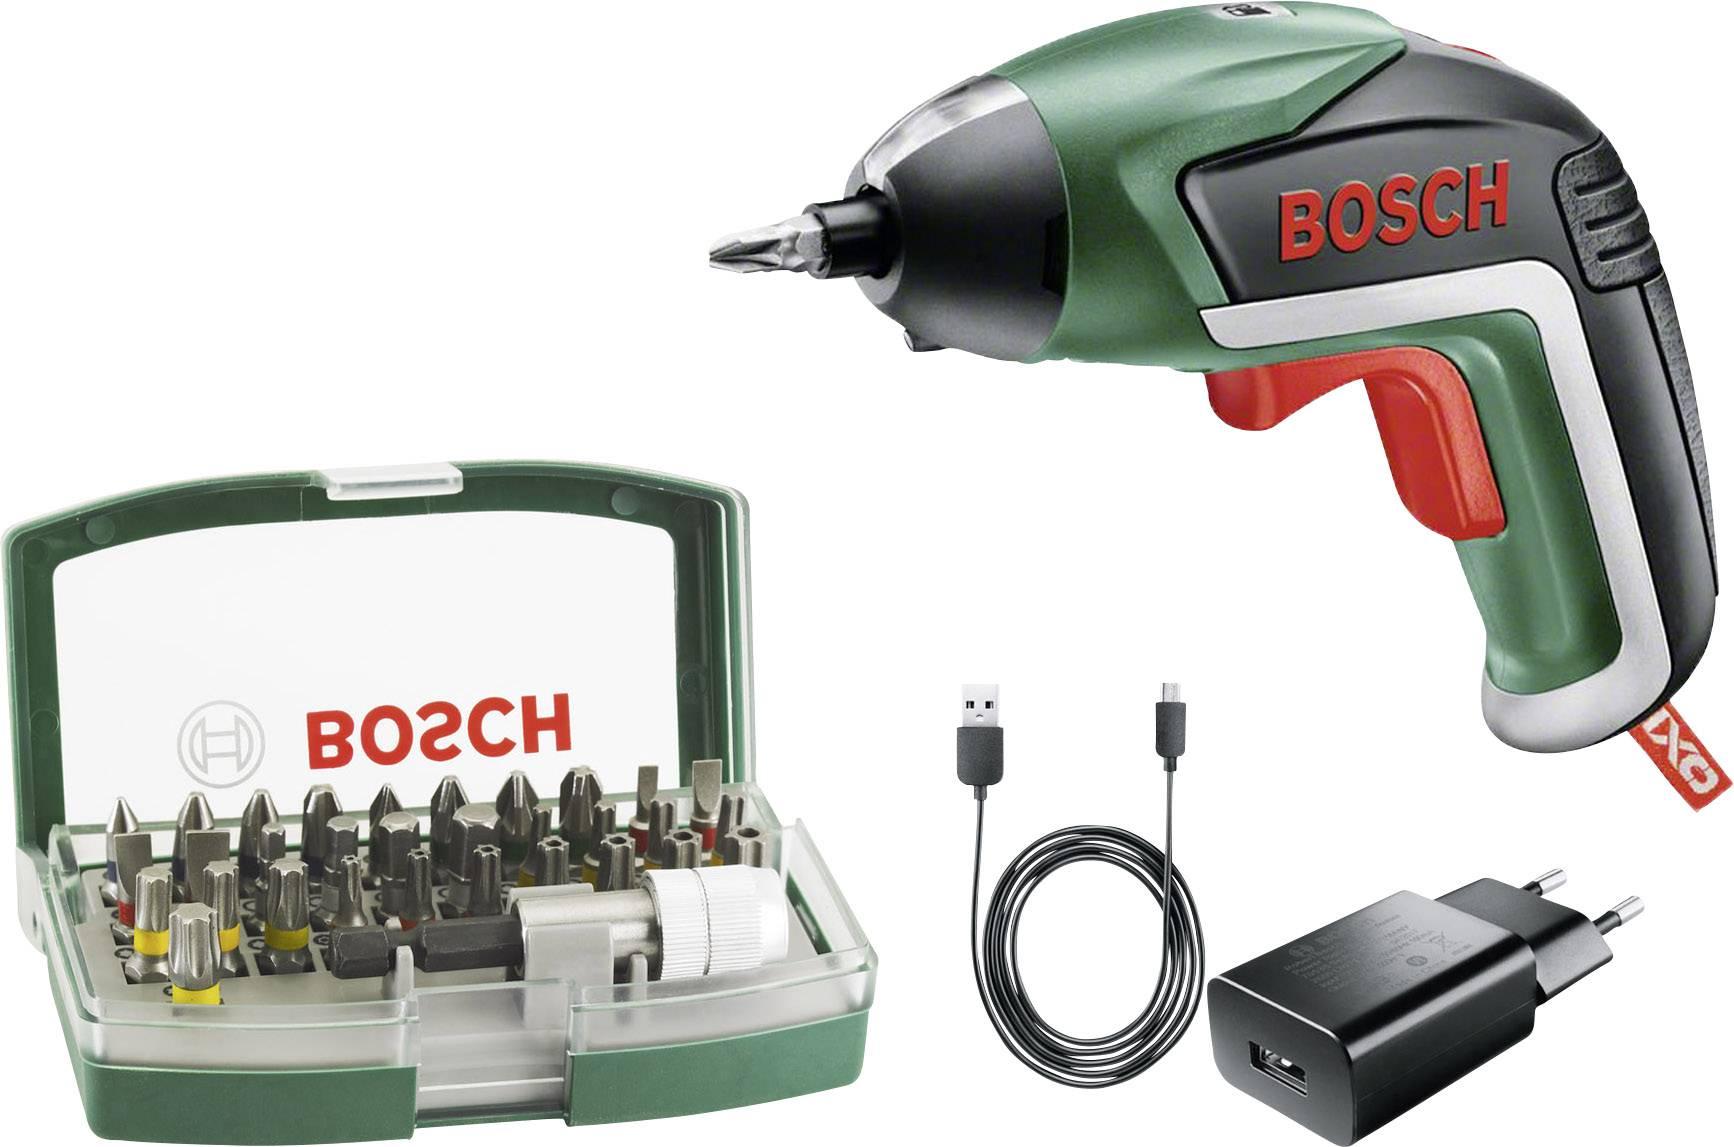 Bosch Home and Garden IXO V Akku Schrauber 3.6 V 1.5 Ah Li Ion inkl. Akku, inkl. Zubehör